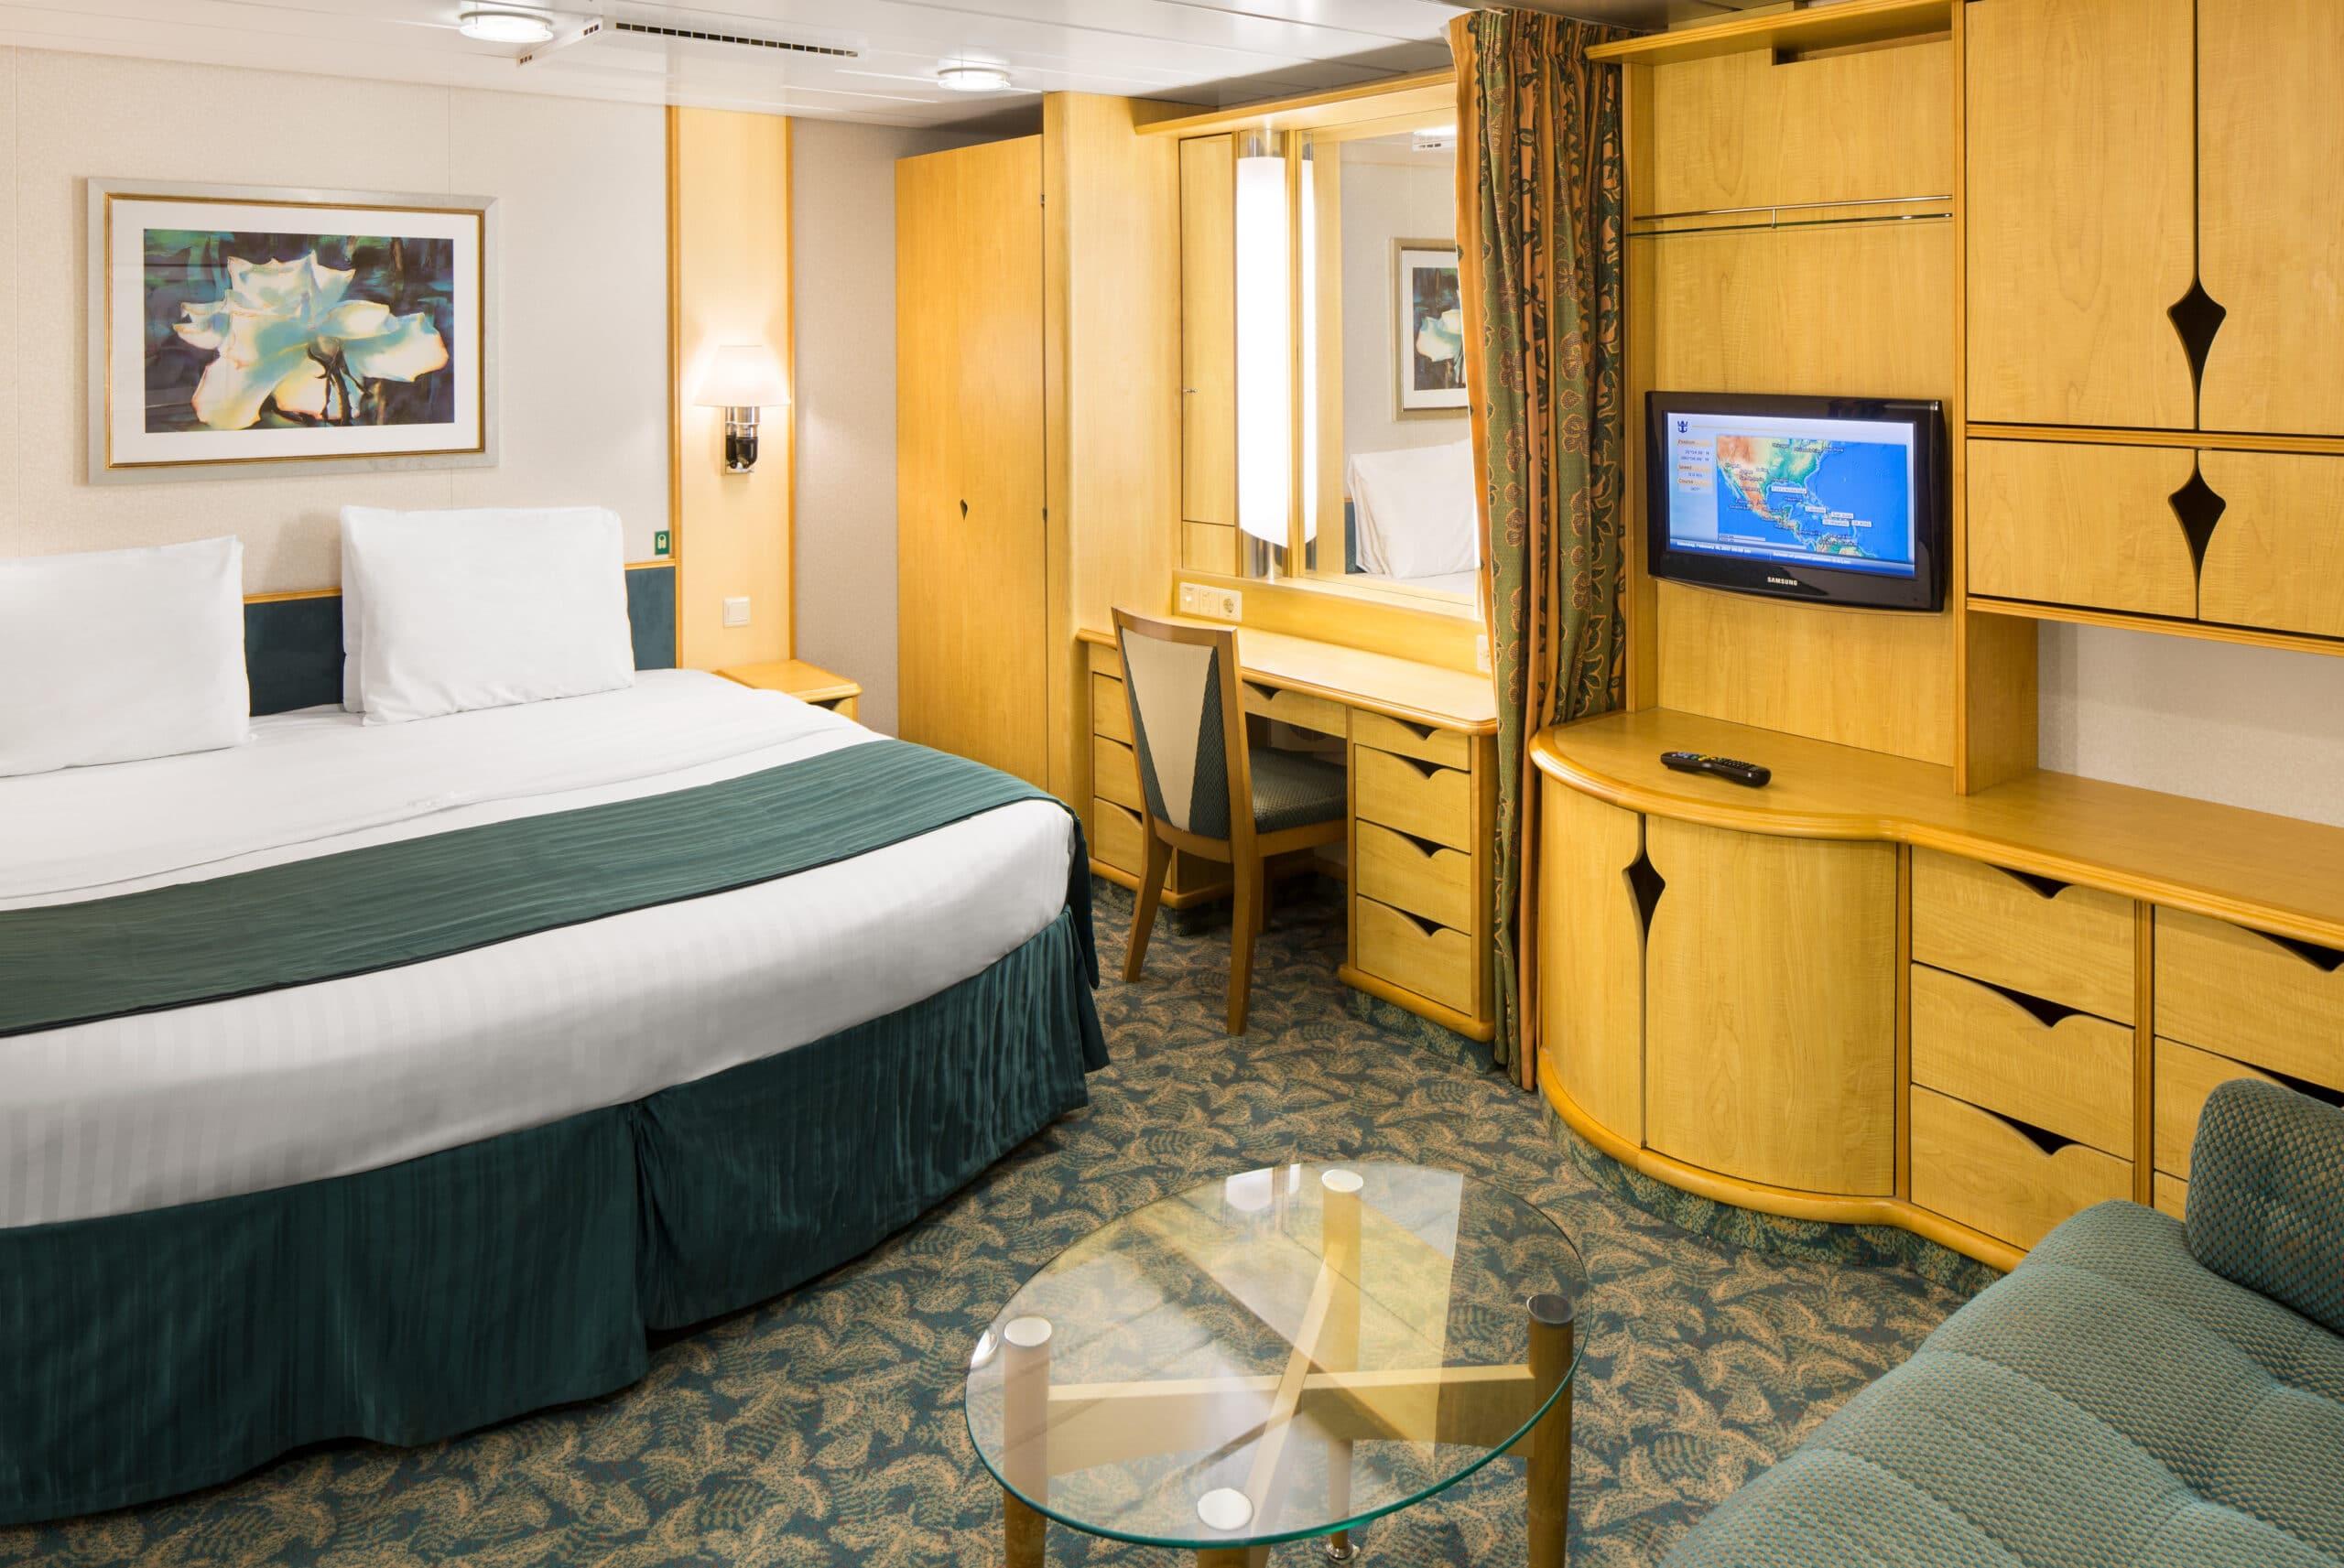 Royal-Caribbean-International-Freedom-of-the-Seas-Liberty-of-the Seas-Independence-of-the-seas-schip-cruiseschip-categorie 1R-ruime binnenhut